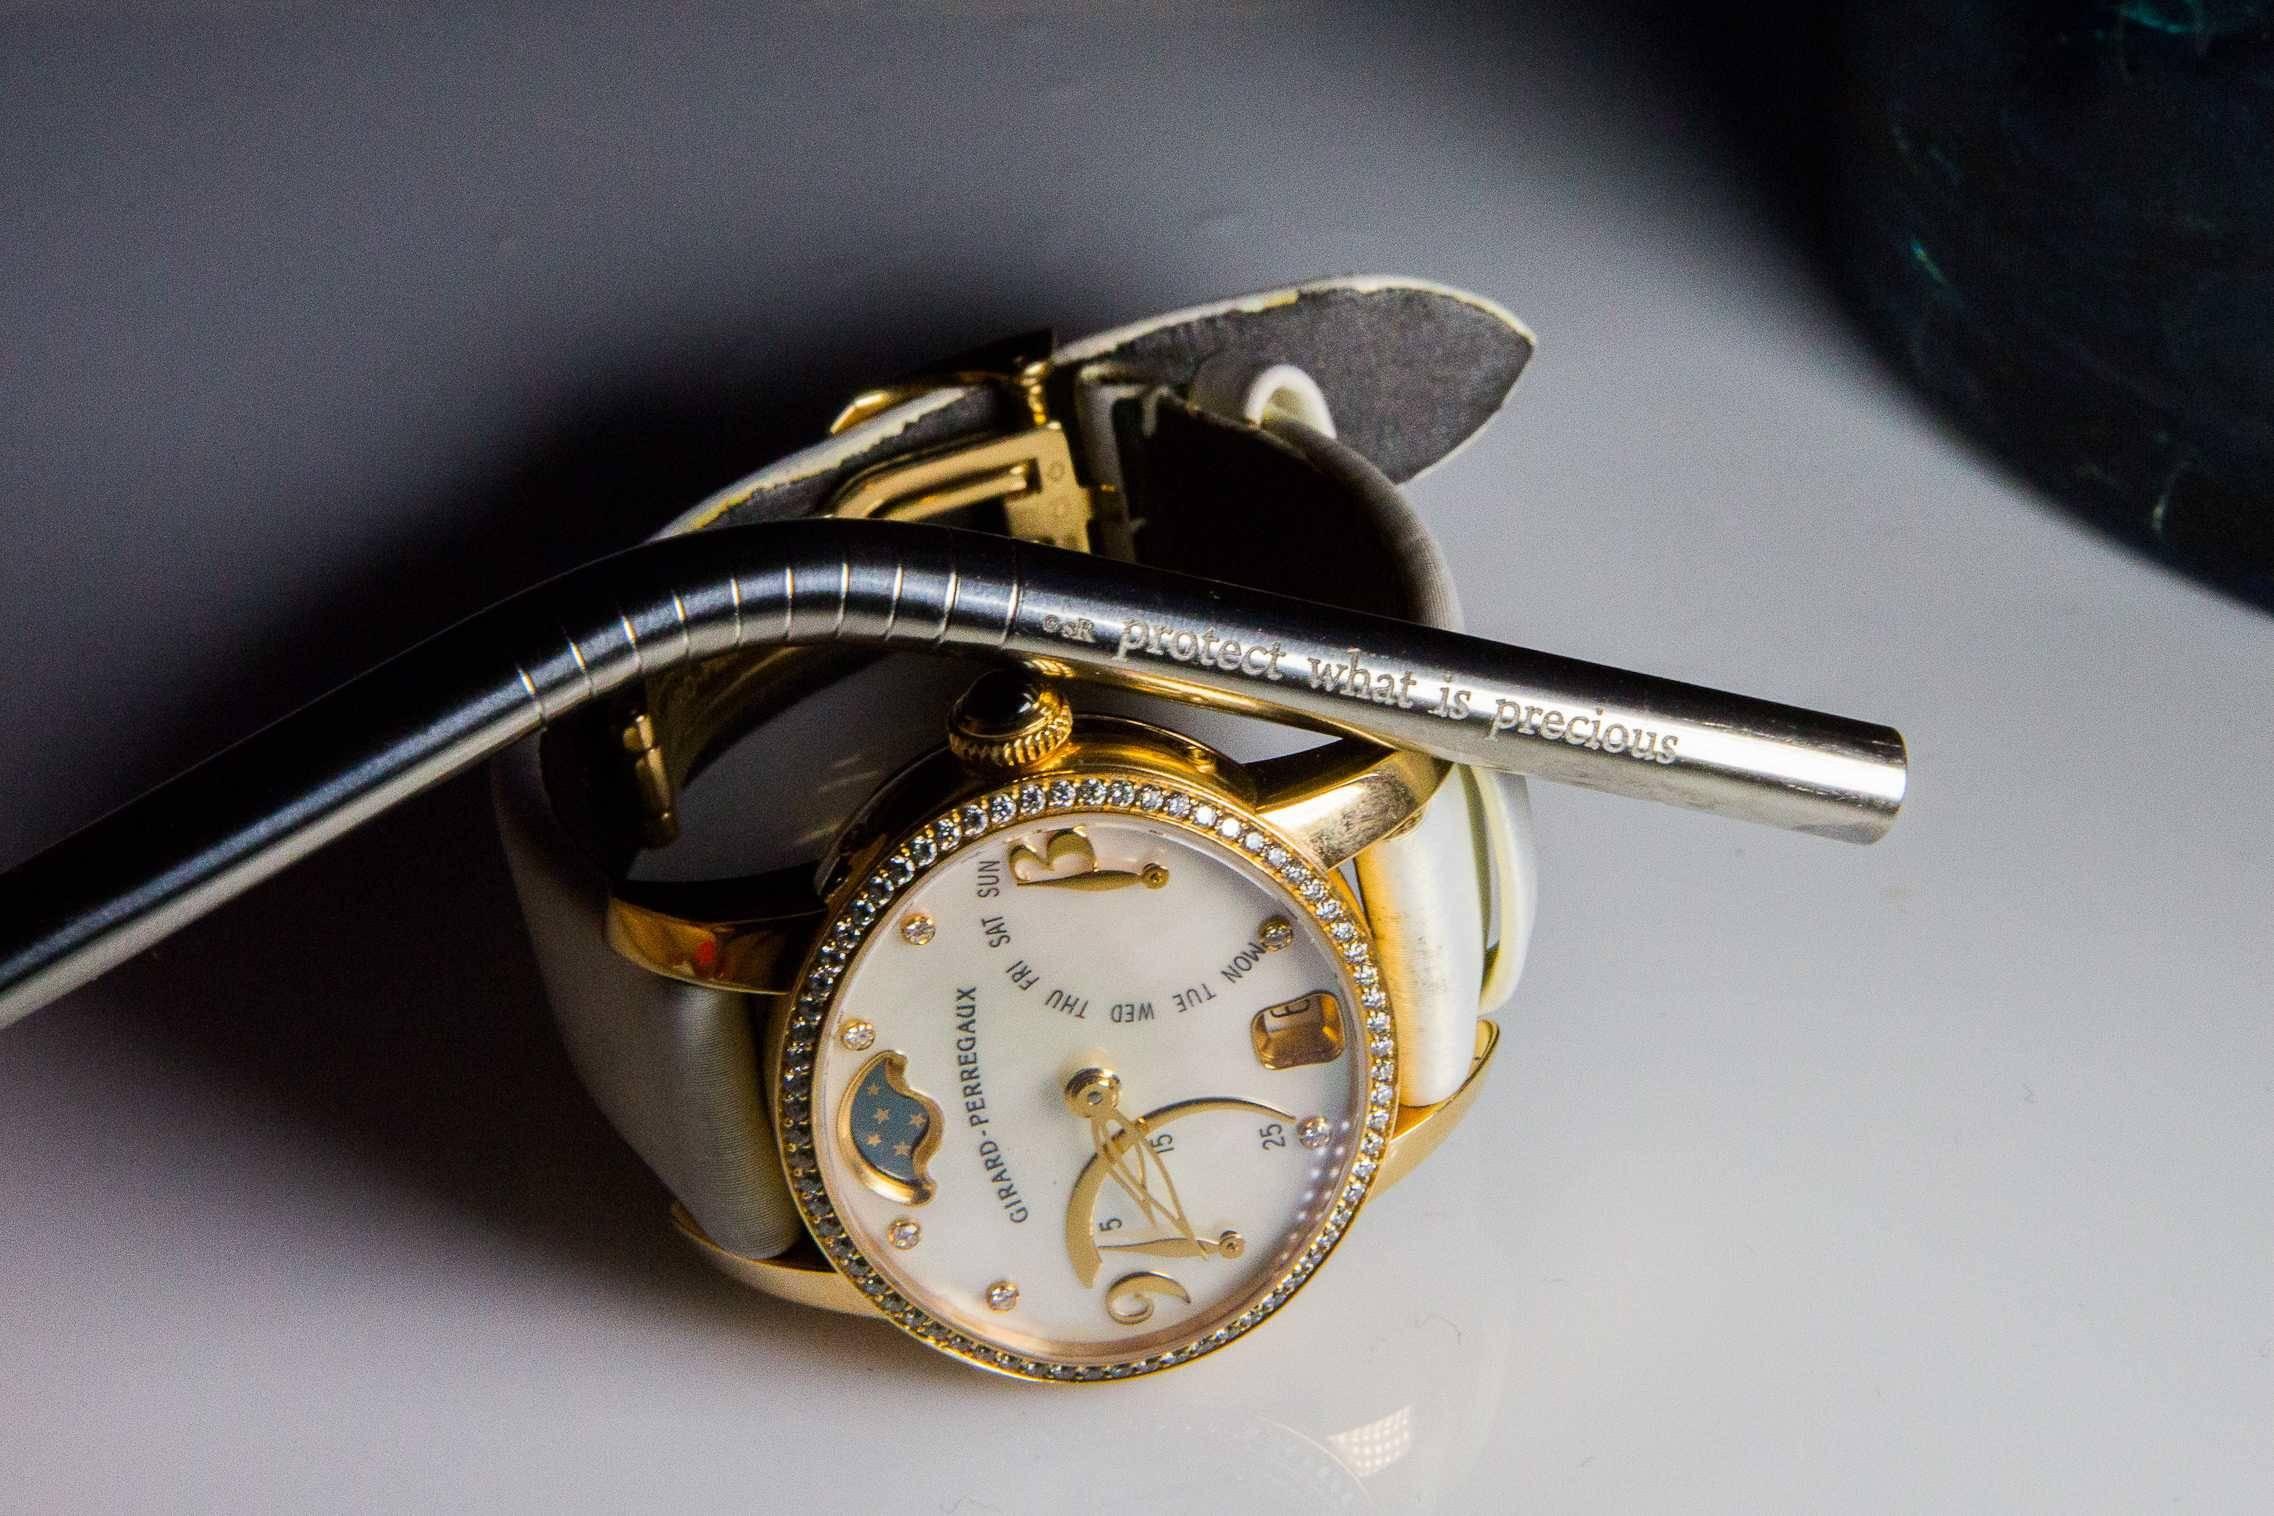 Susan Rockefeller Straw and Girard-Perregaux watch